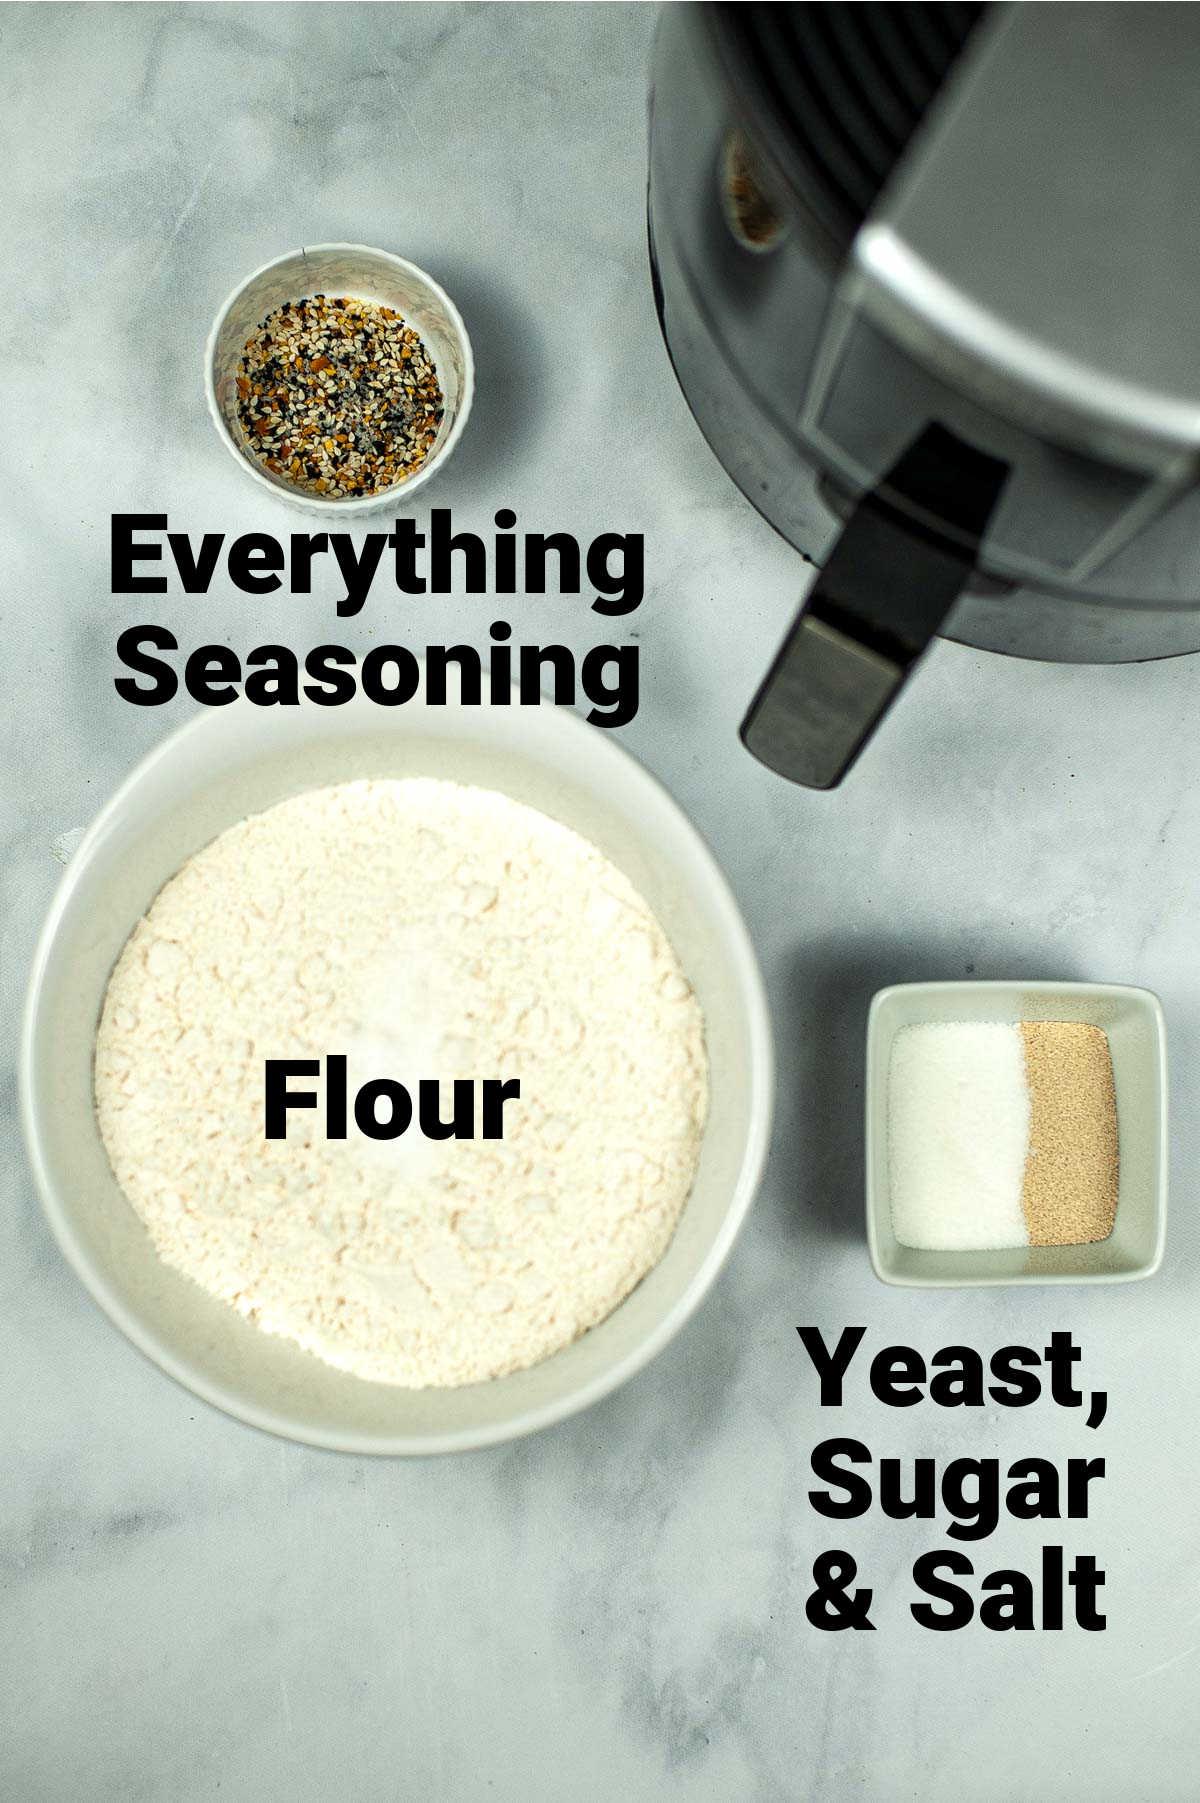 top down view of the ingredients including flour, yeast, sugar salt and seasoning.